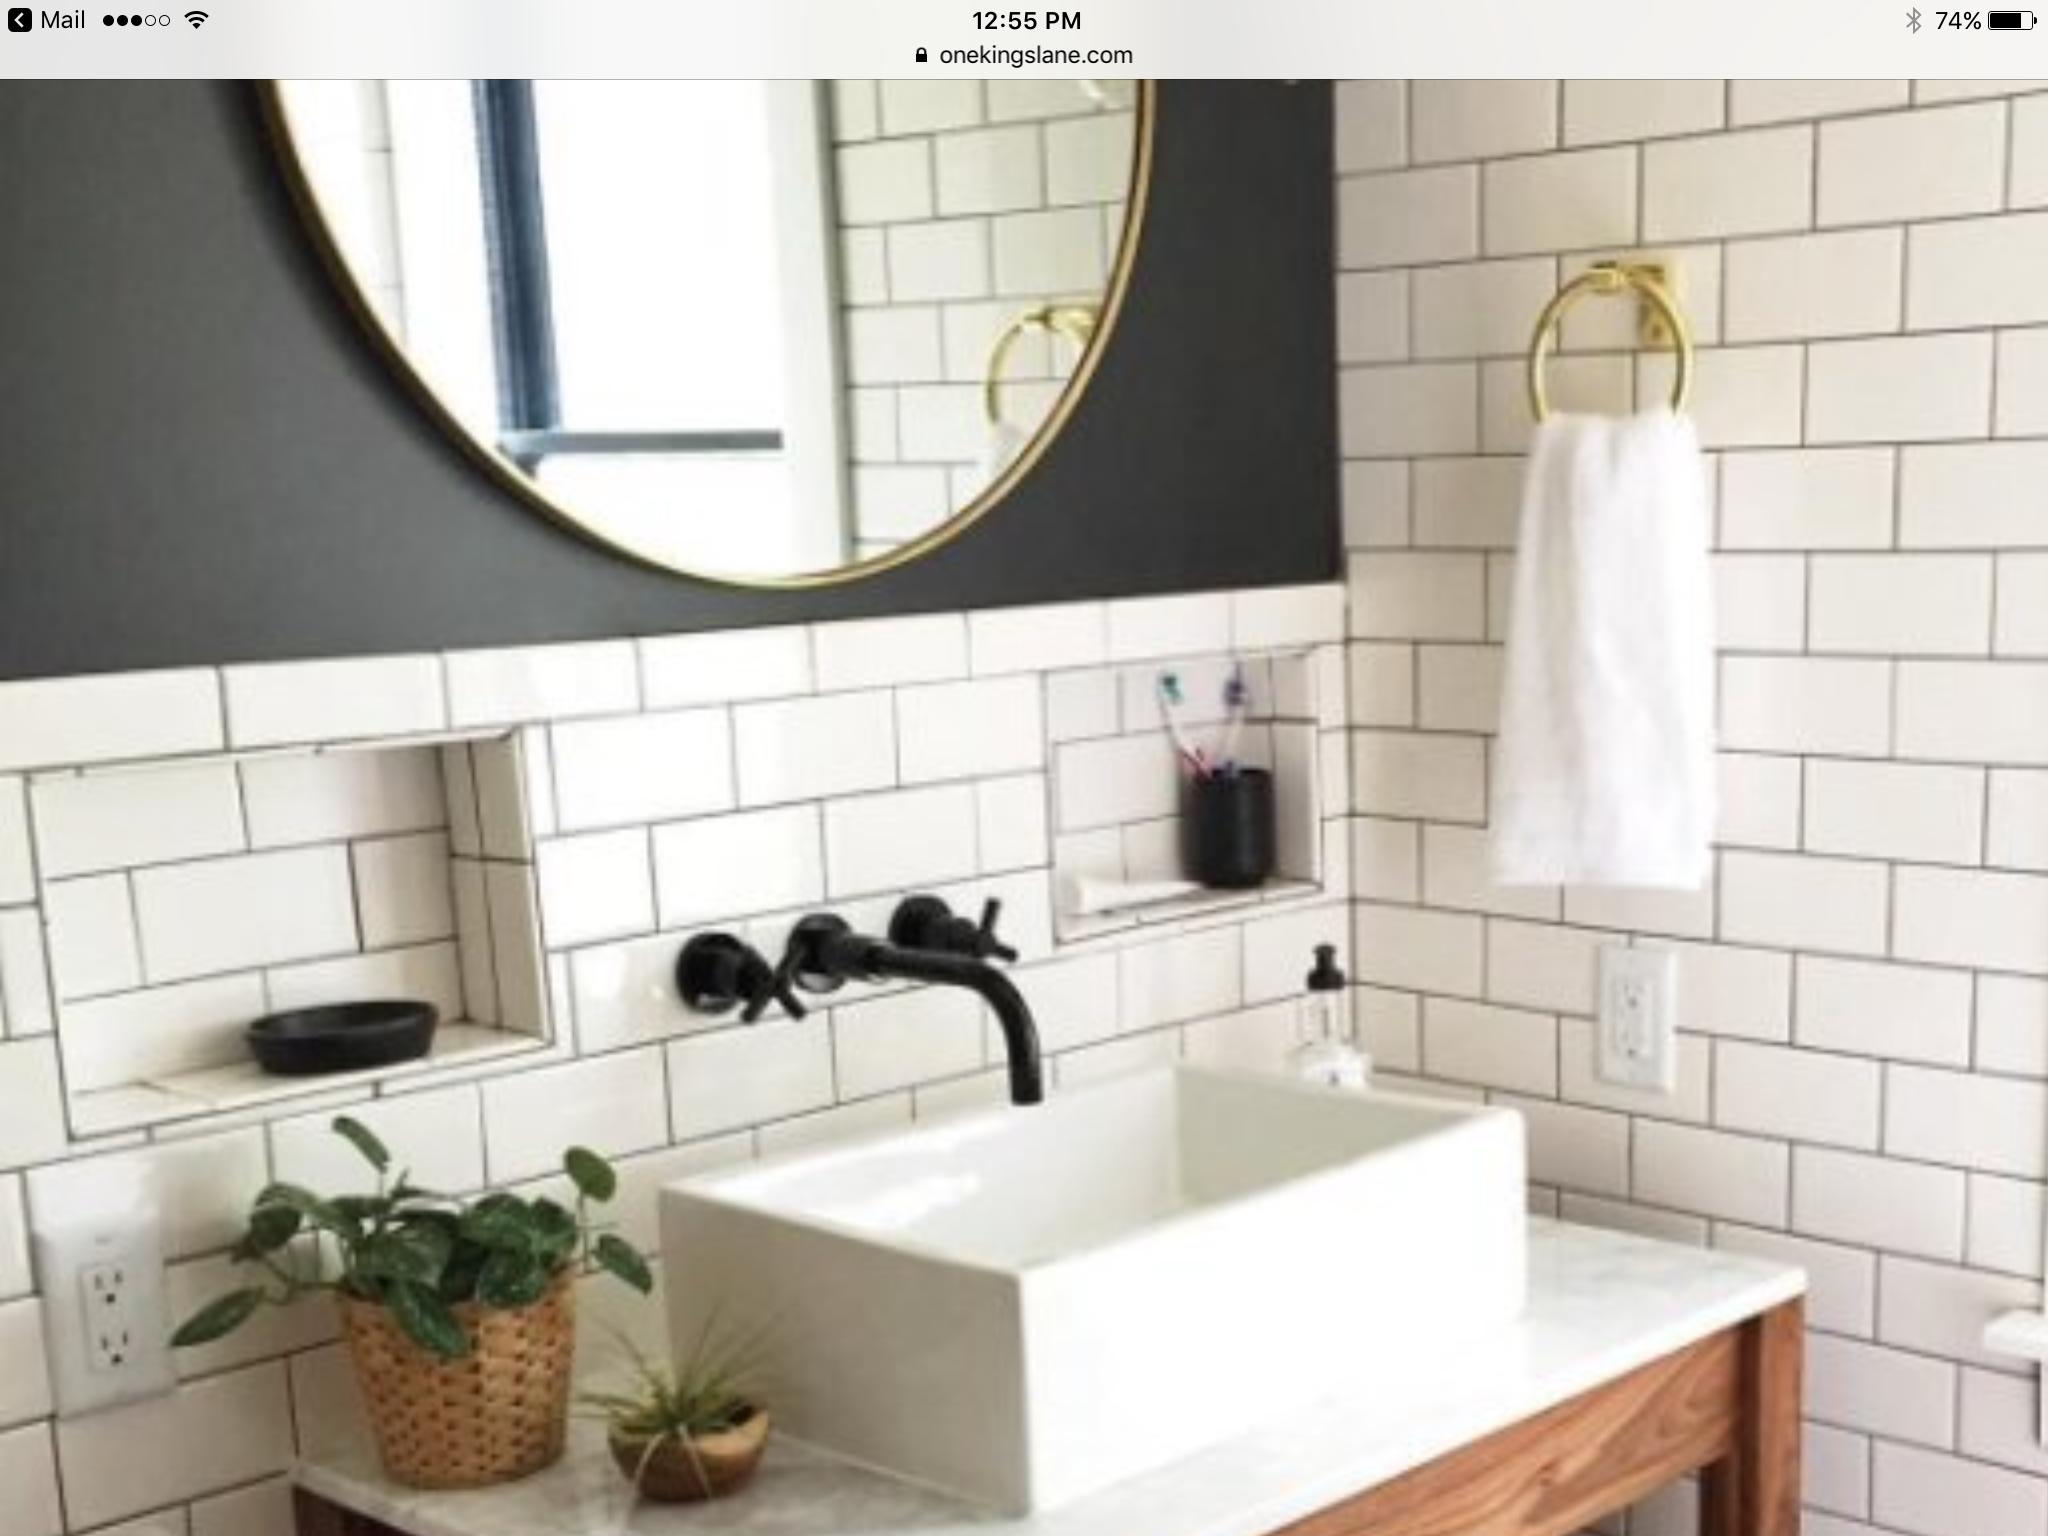 Pin by Diana Katavolos on Bath Styling | Pinterest | Tile design ...